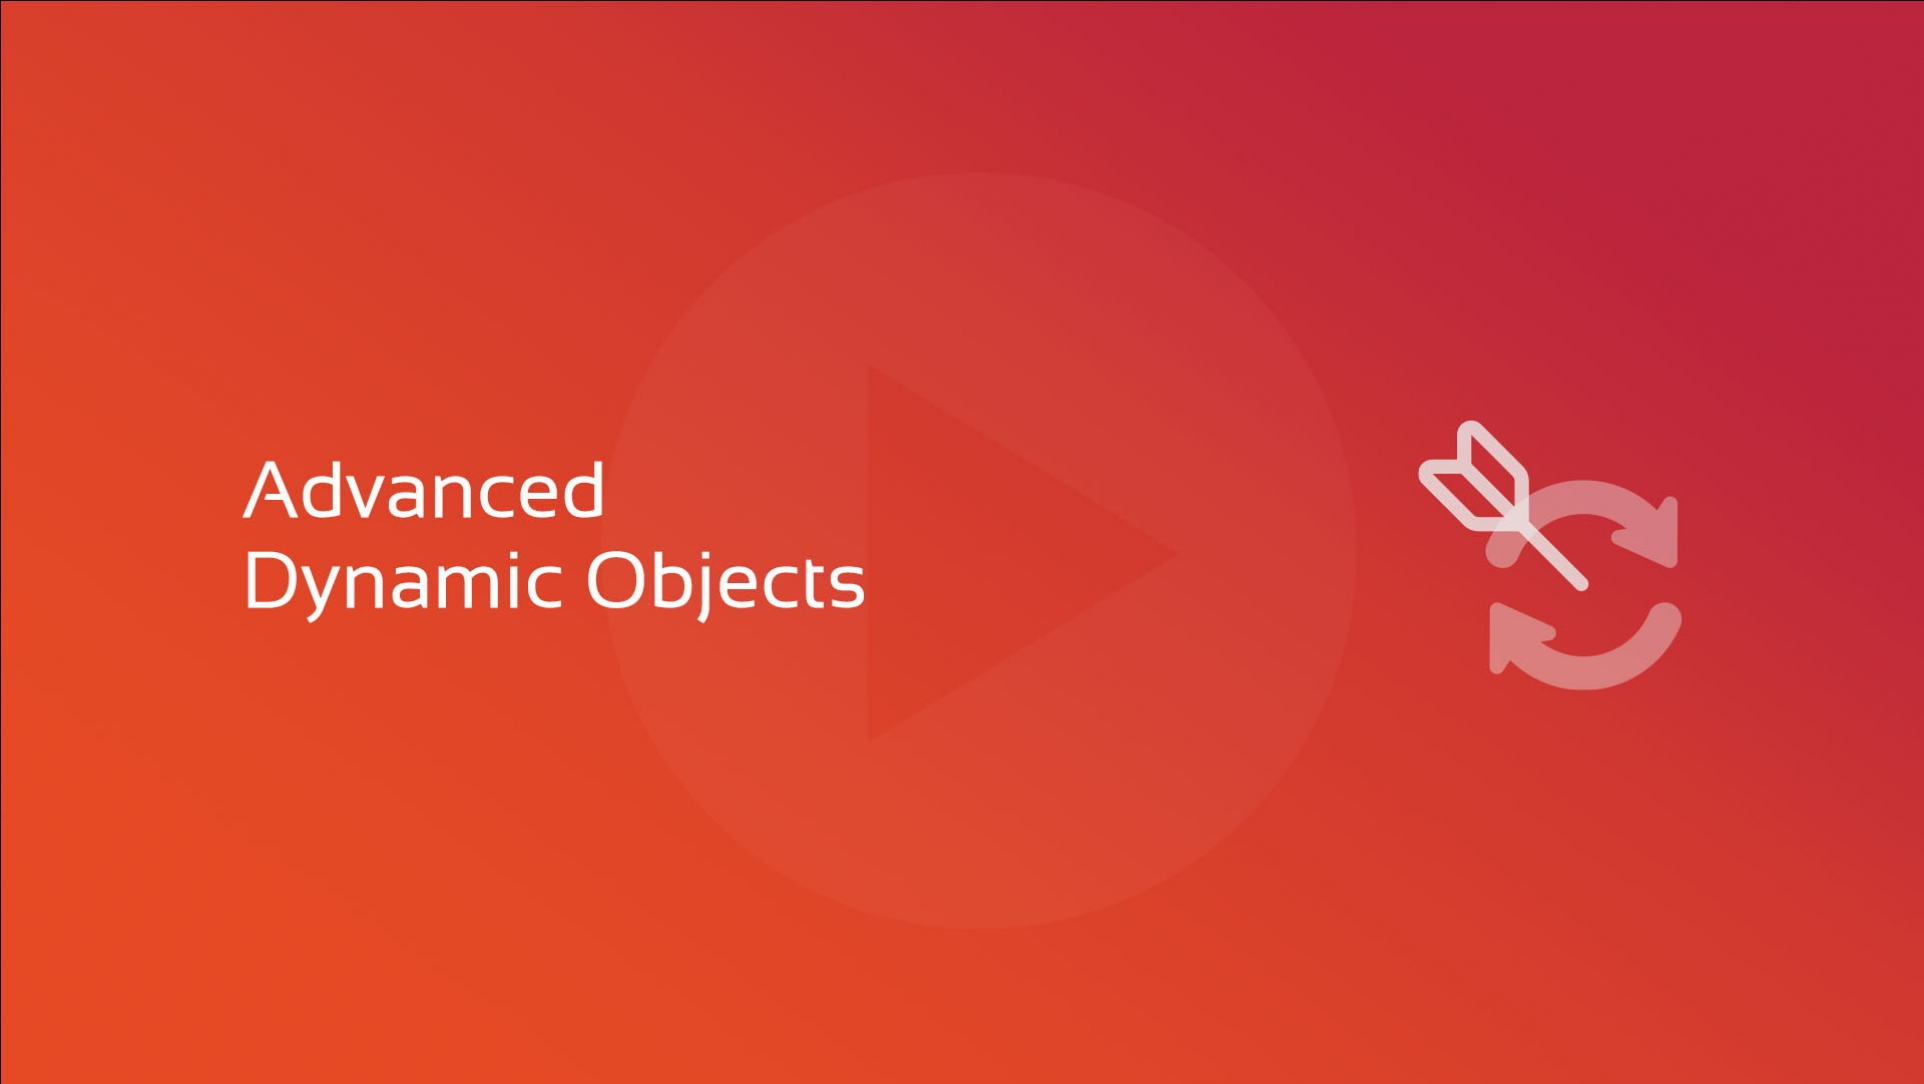 2020-03-09 Advanced Dynamic Objects OG V2